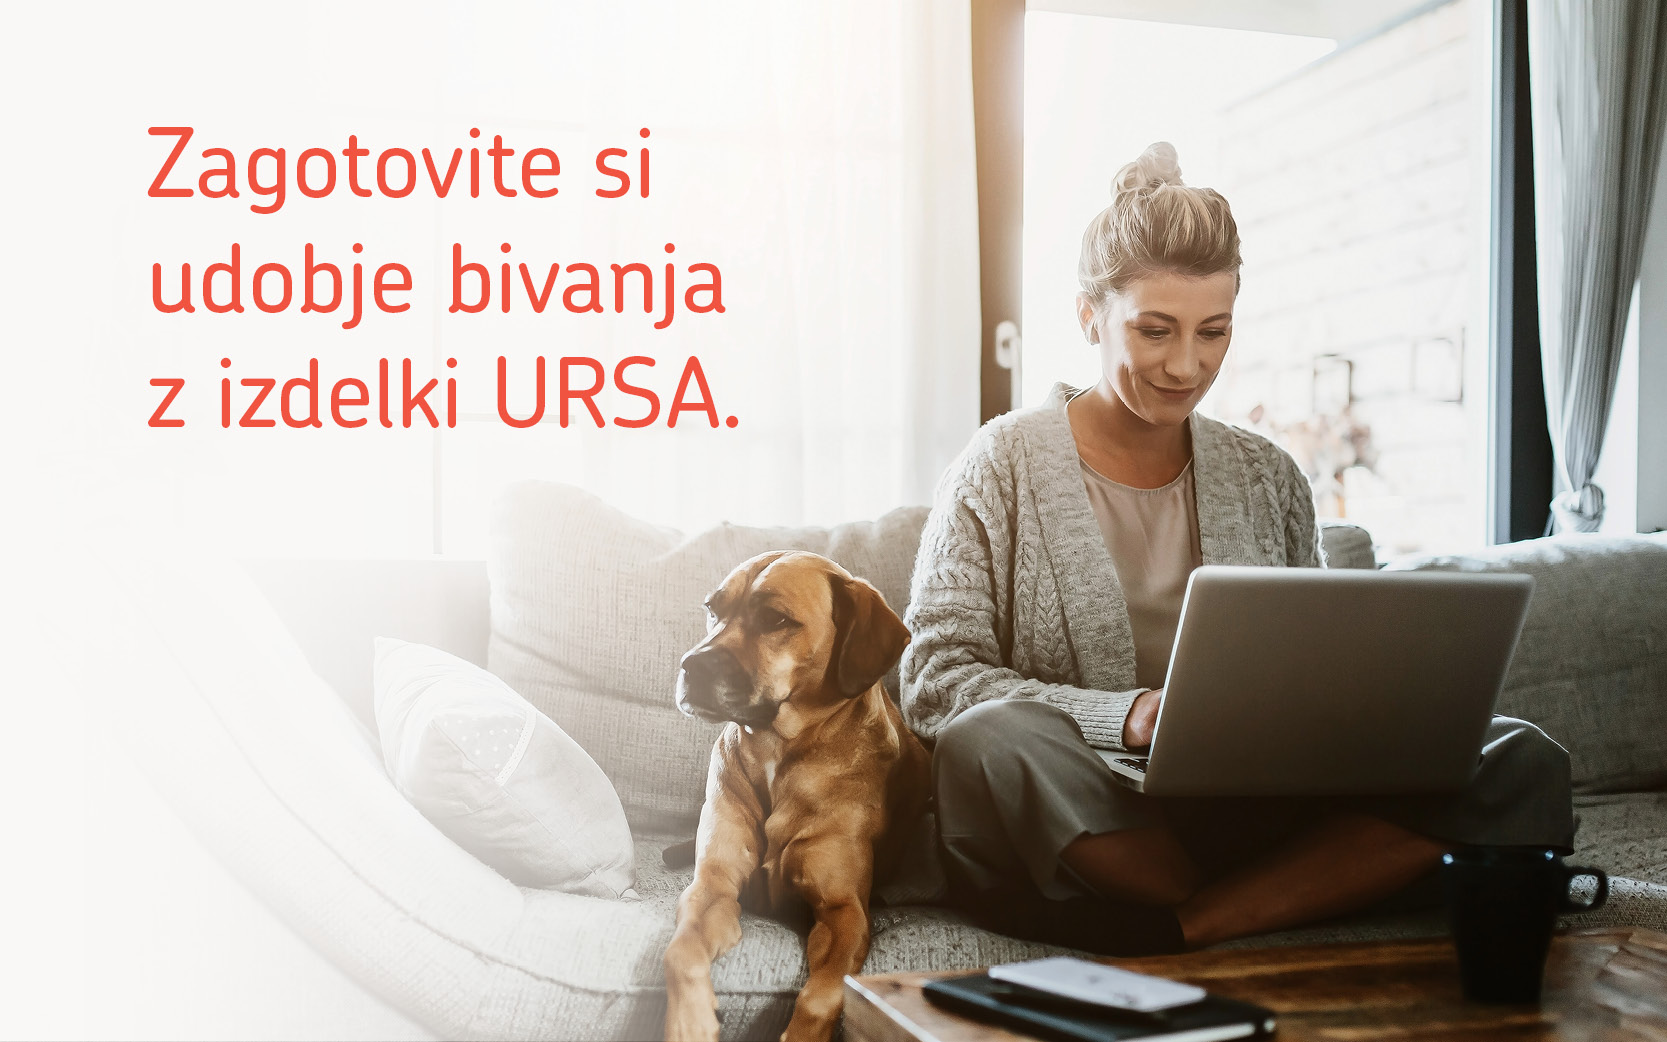 ursa-1610099988.jpg